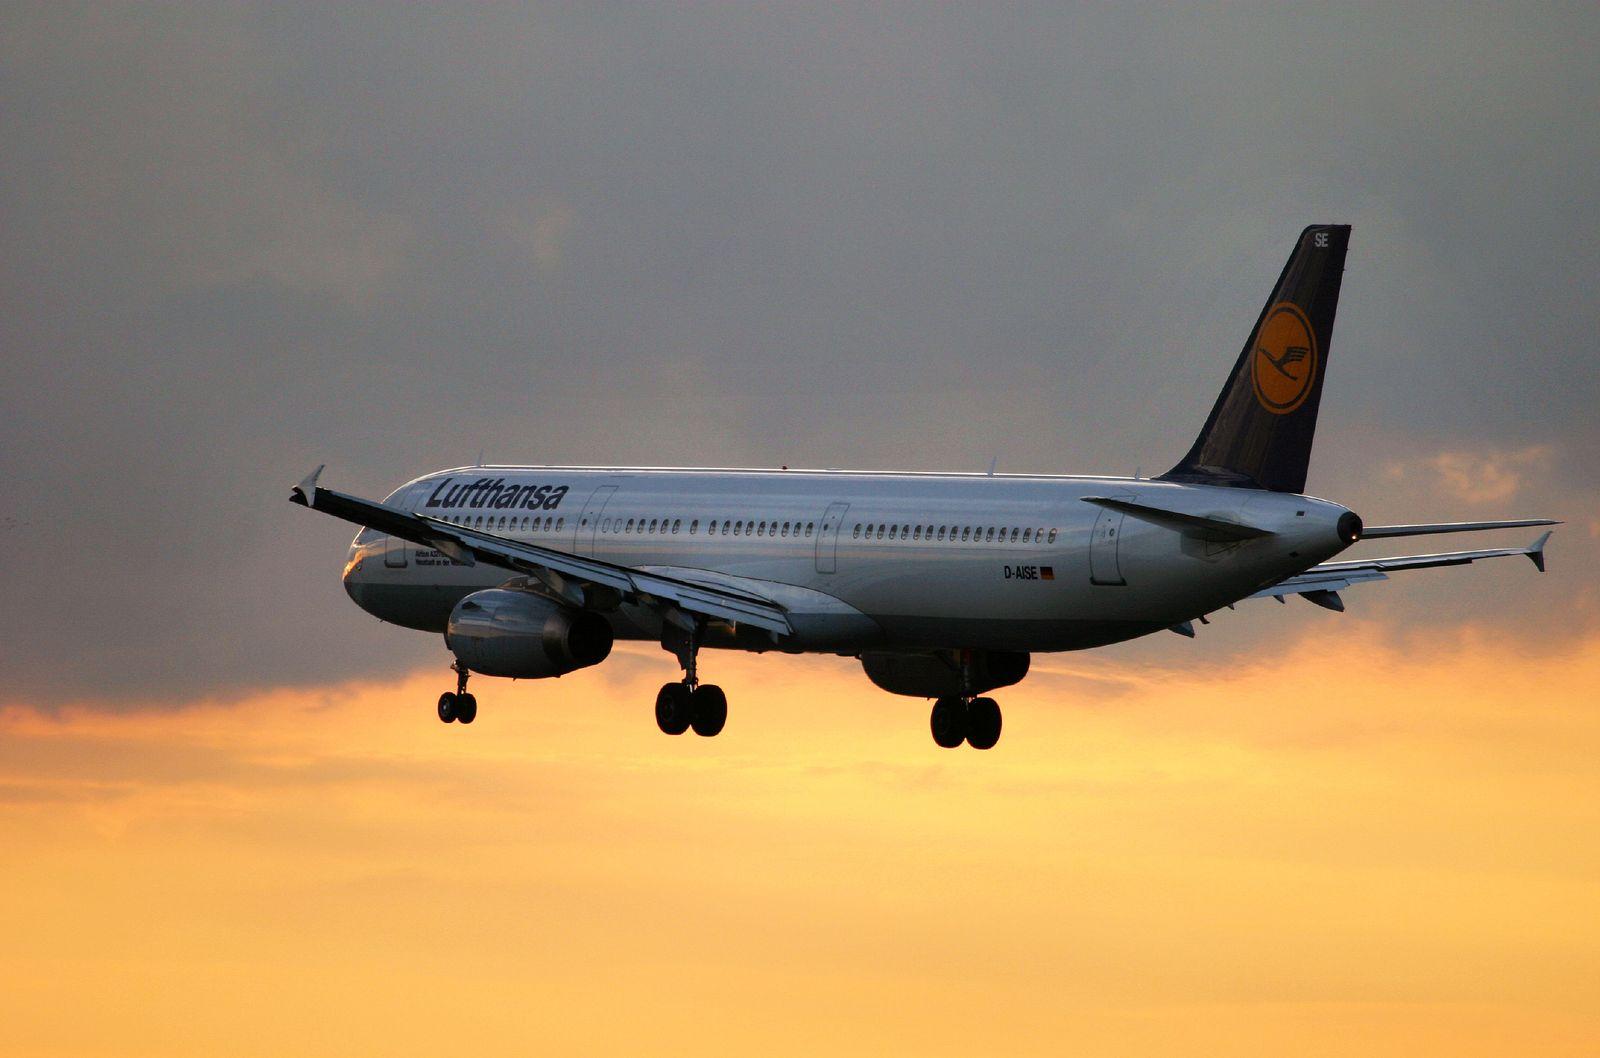 Lufthansa A321 im Anflug